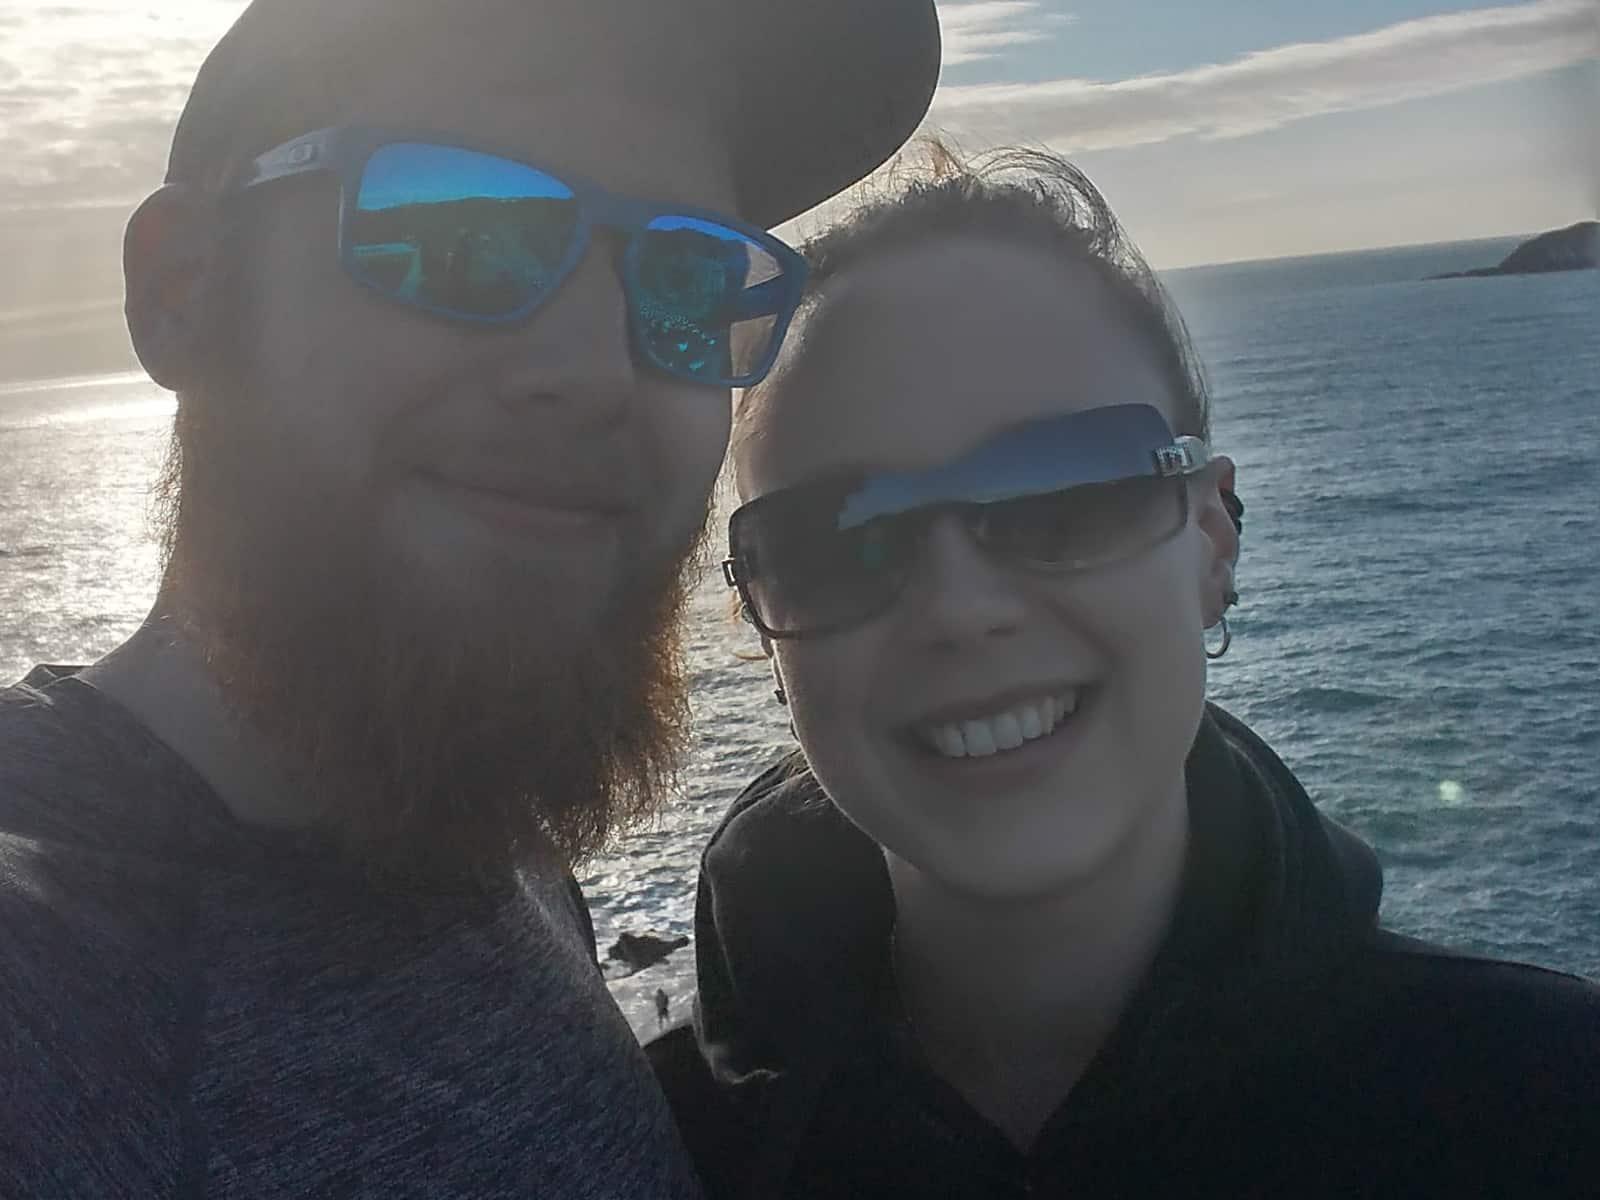 Nichole & Richard from Auckland, New Zealand